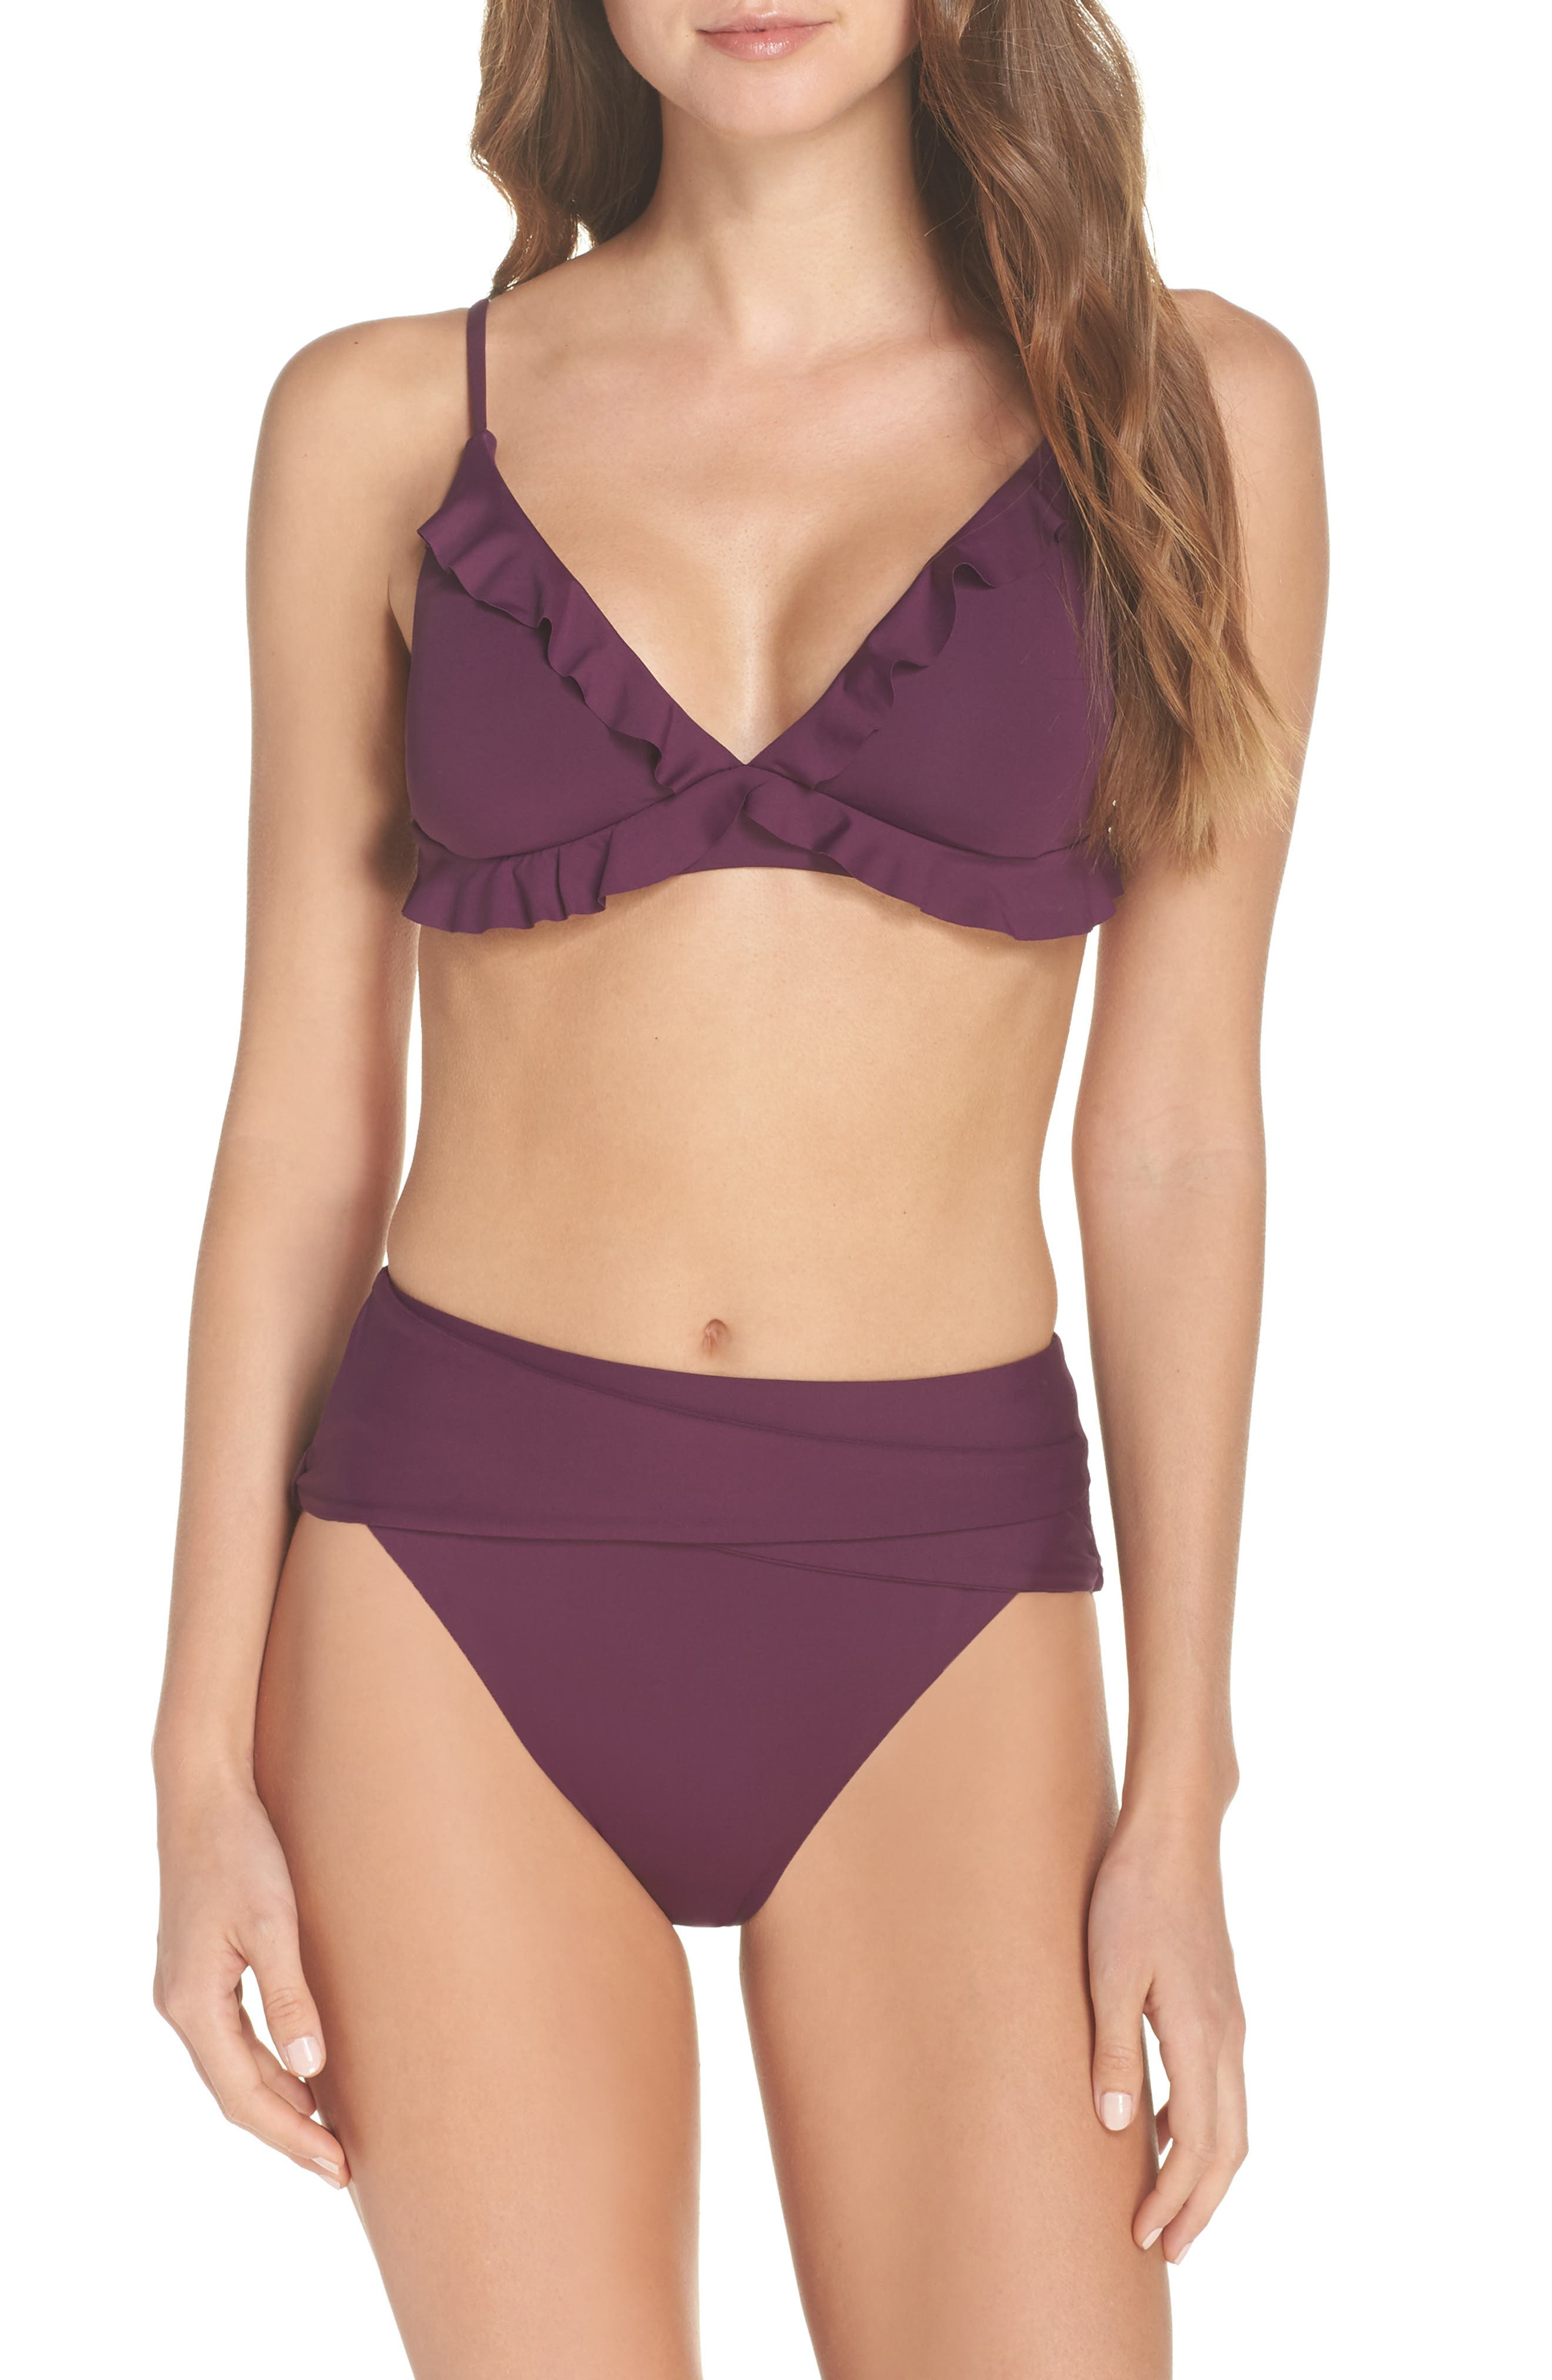 BECCA, Color Code Crossover High Waist Bikini Bottoms, Alternate thumbnail 8, color, MERLOT